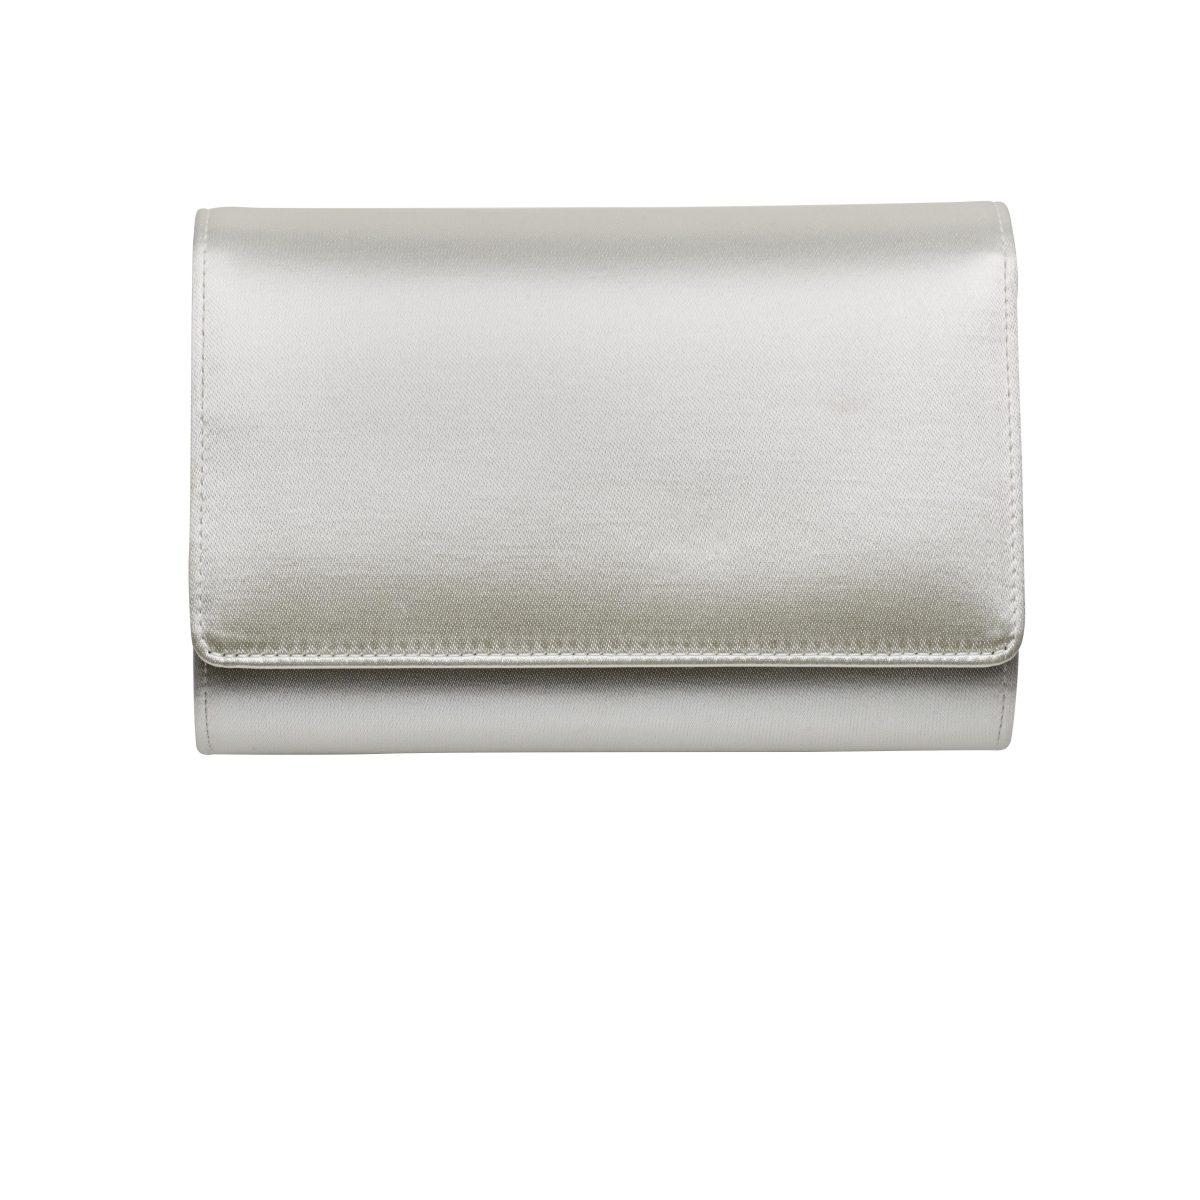 Rainbow Club Dafnee Handbag